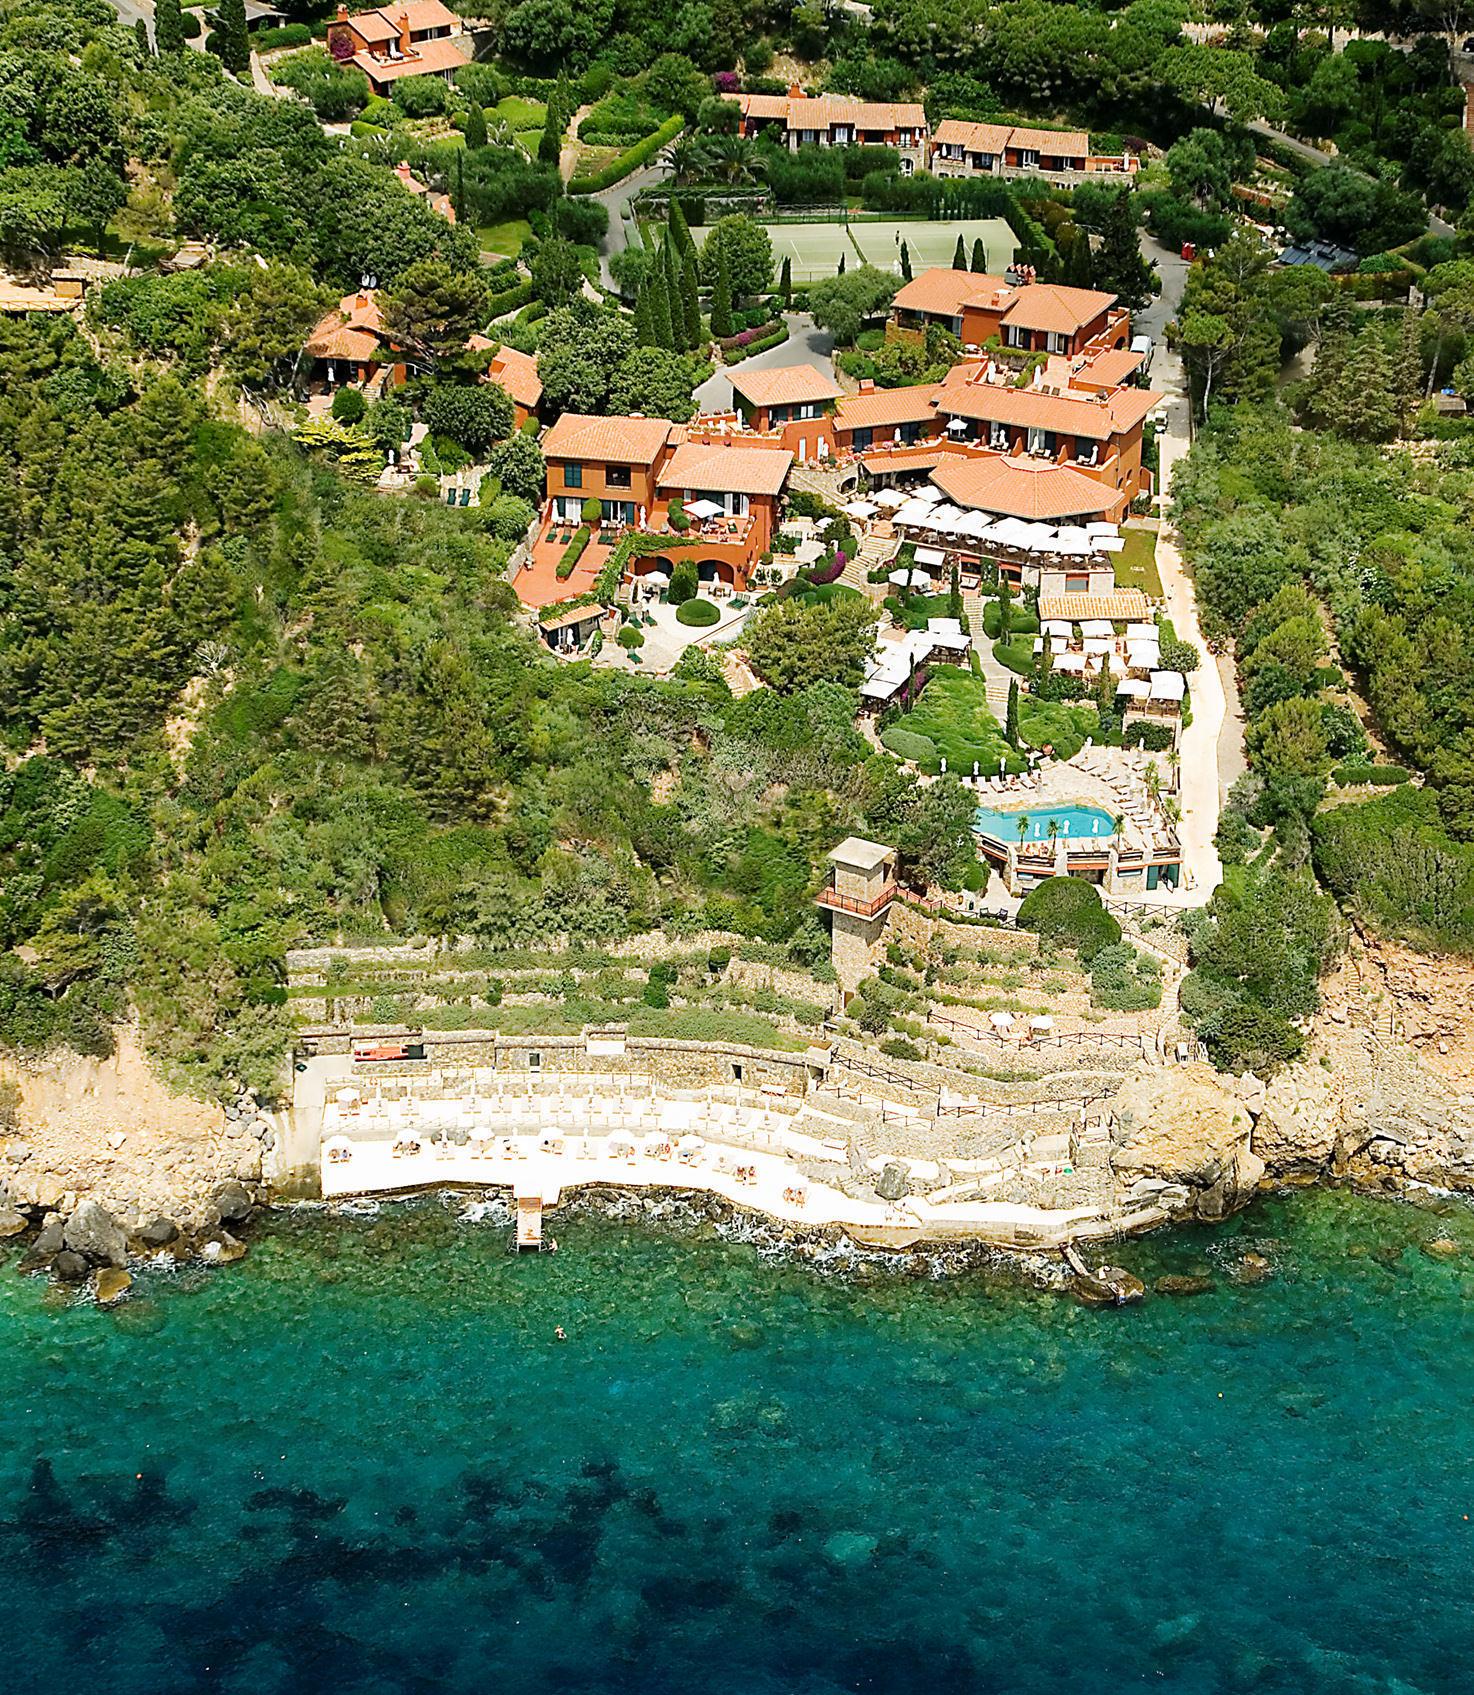 Aerial view of Il Pellicano, Tuscany